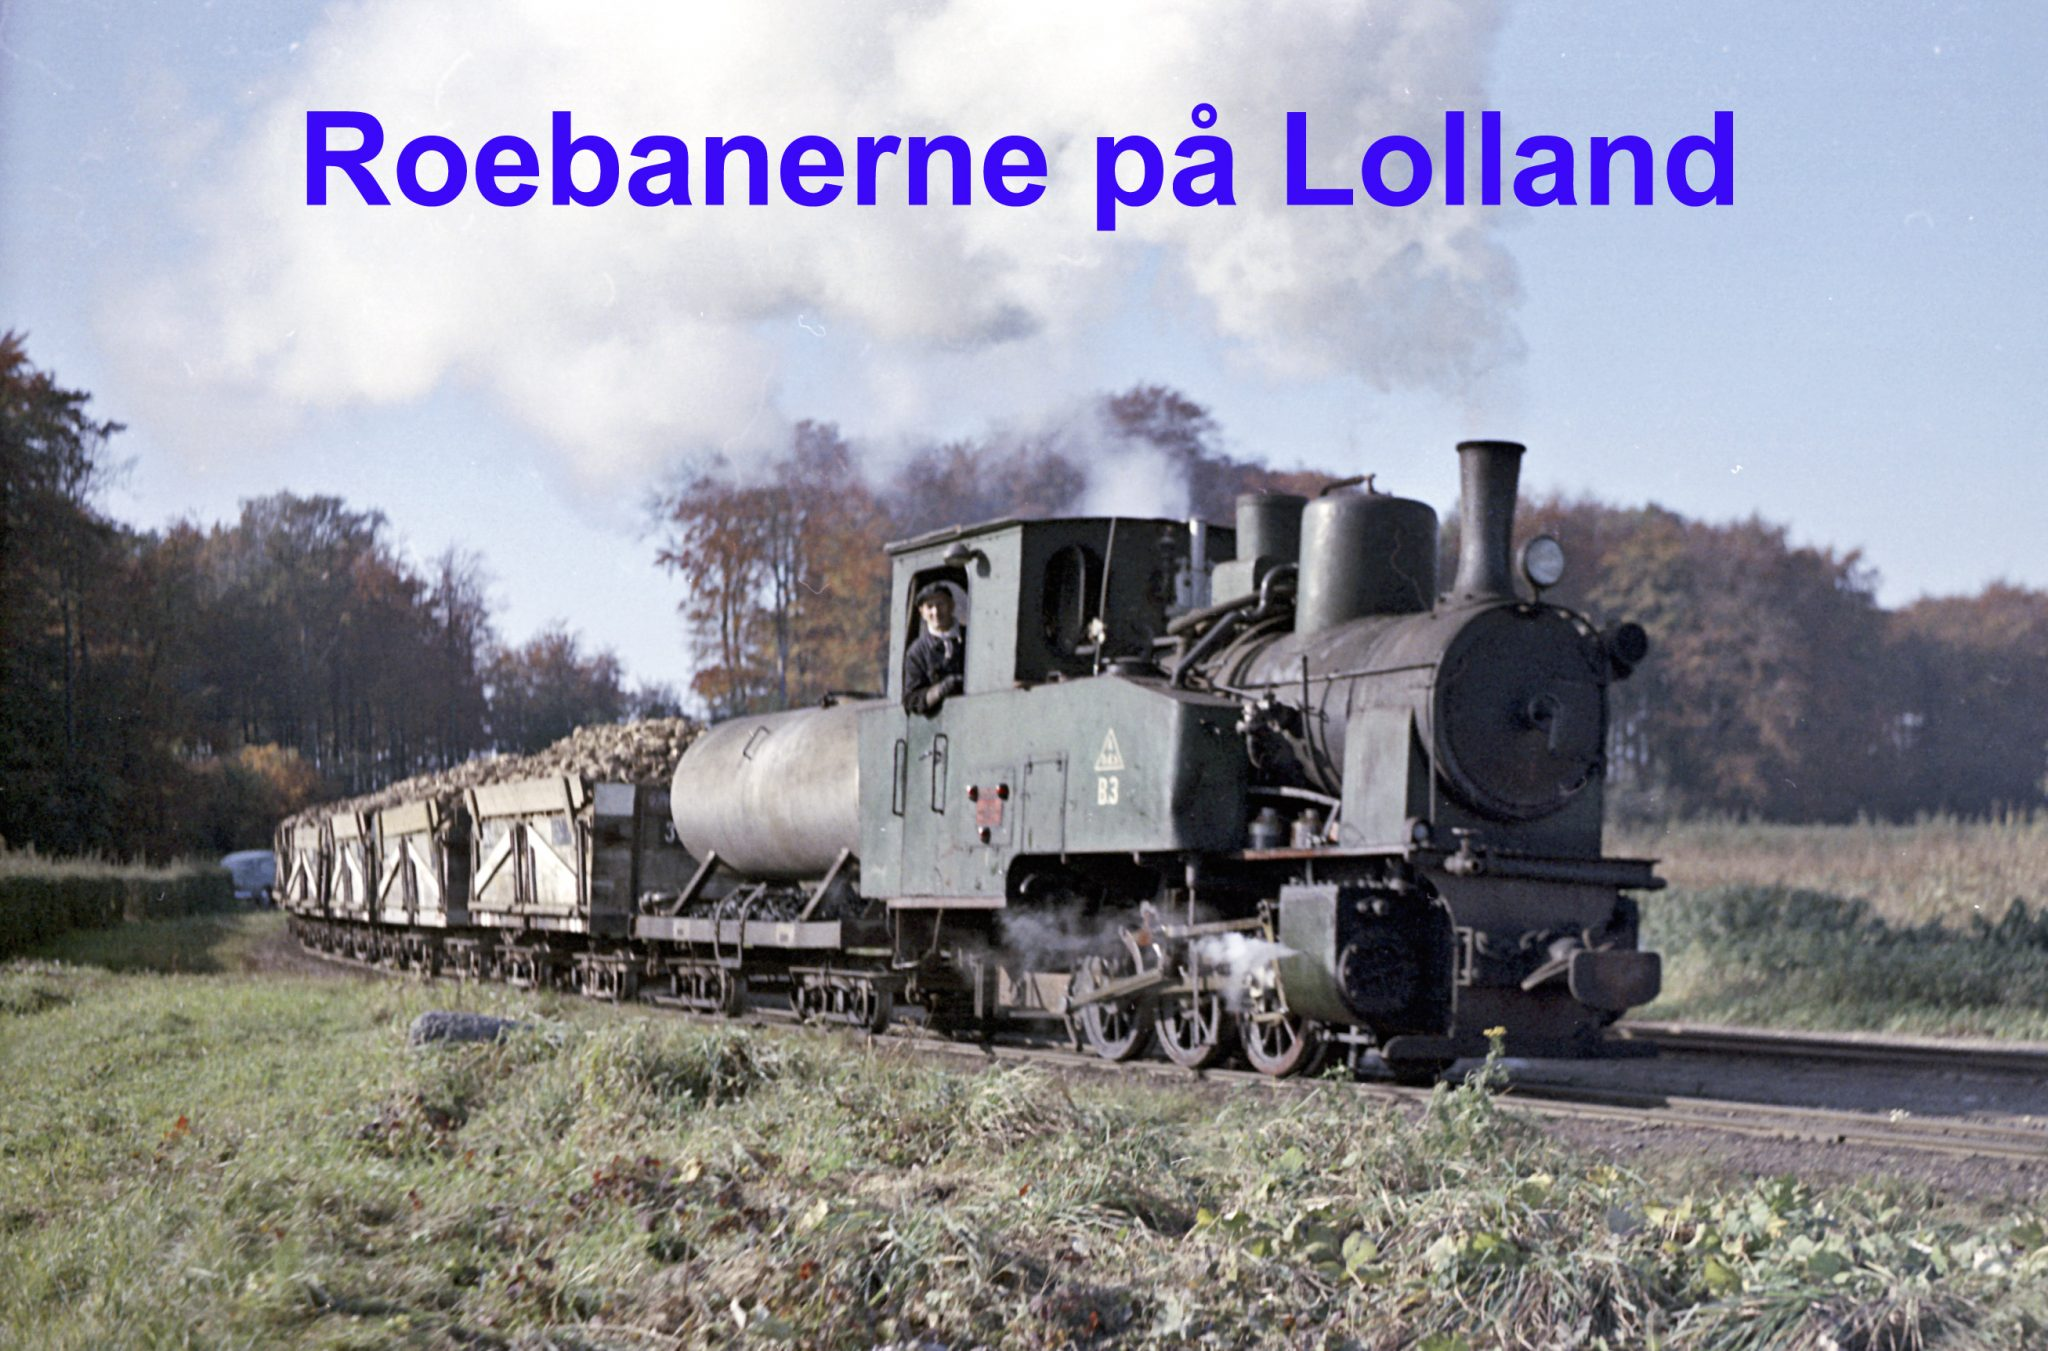 Roebanerne på Lolland / NY DATO